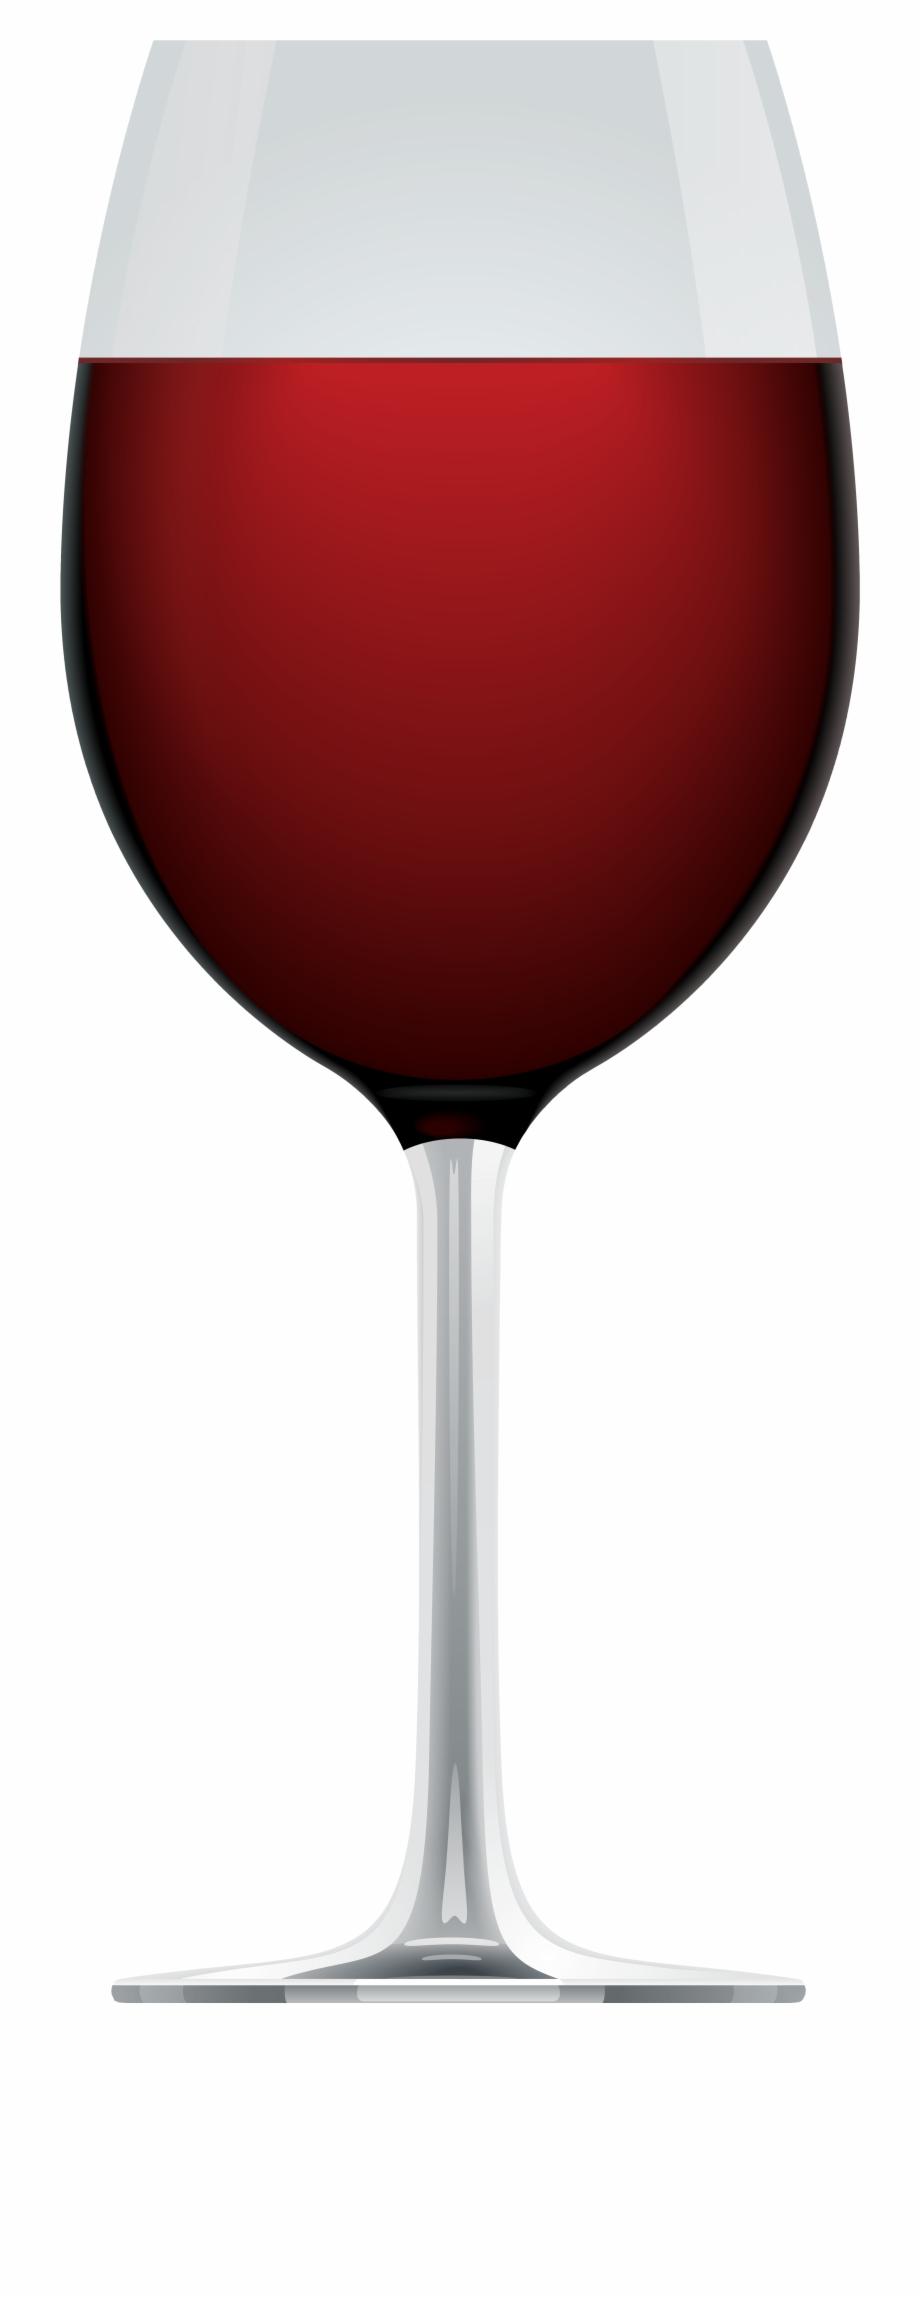 Wine Glass Transparent Png Clip Art.